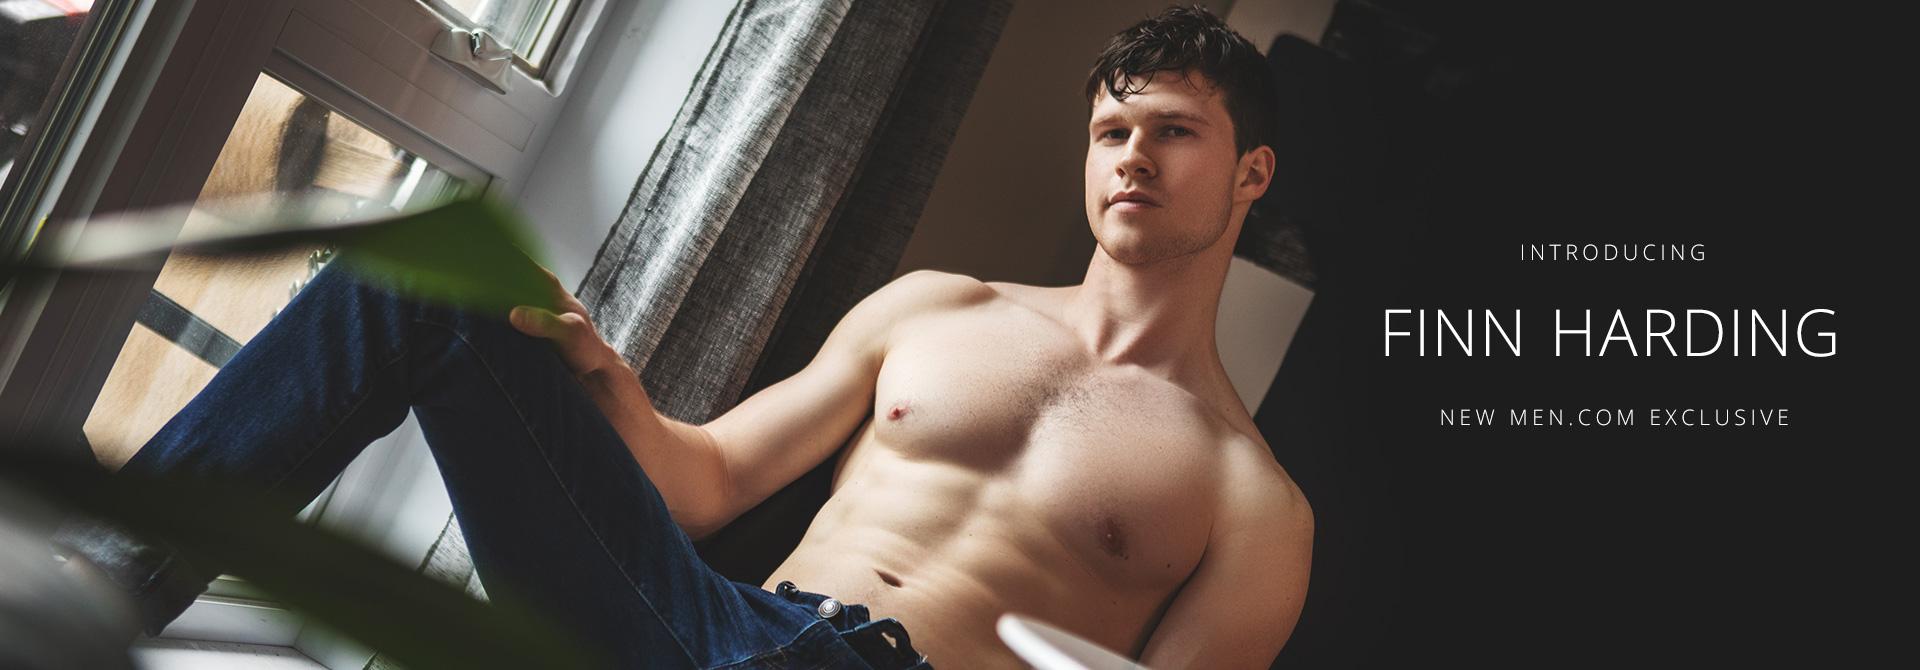 Introducing Finn Harding